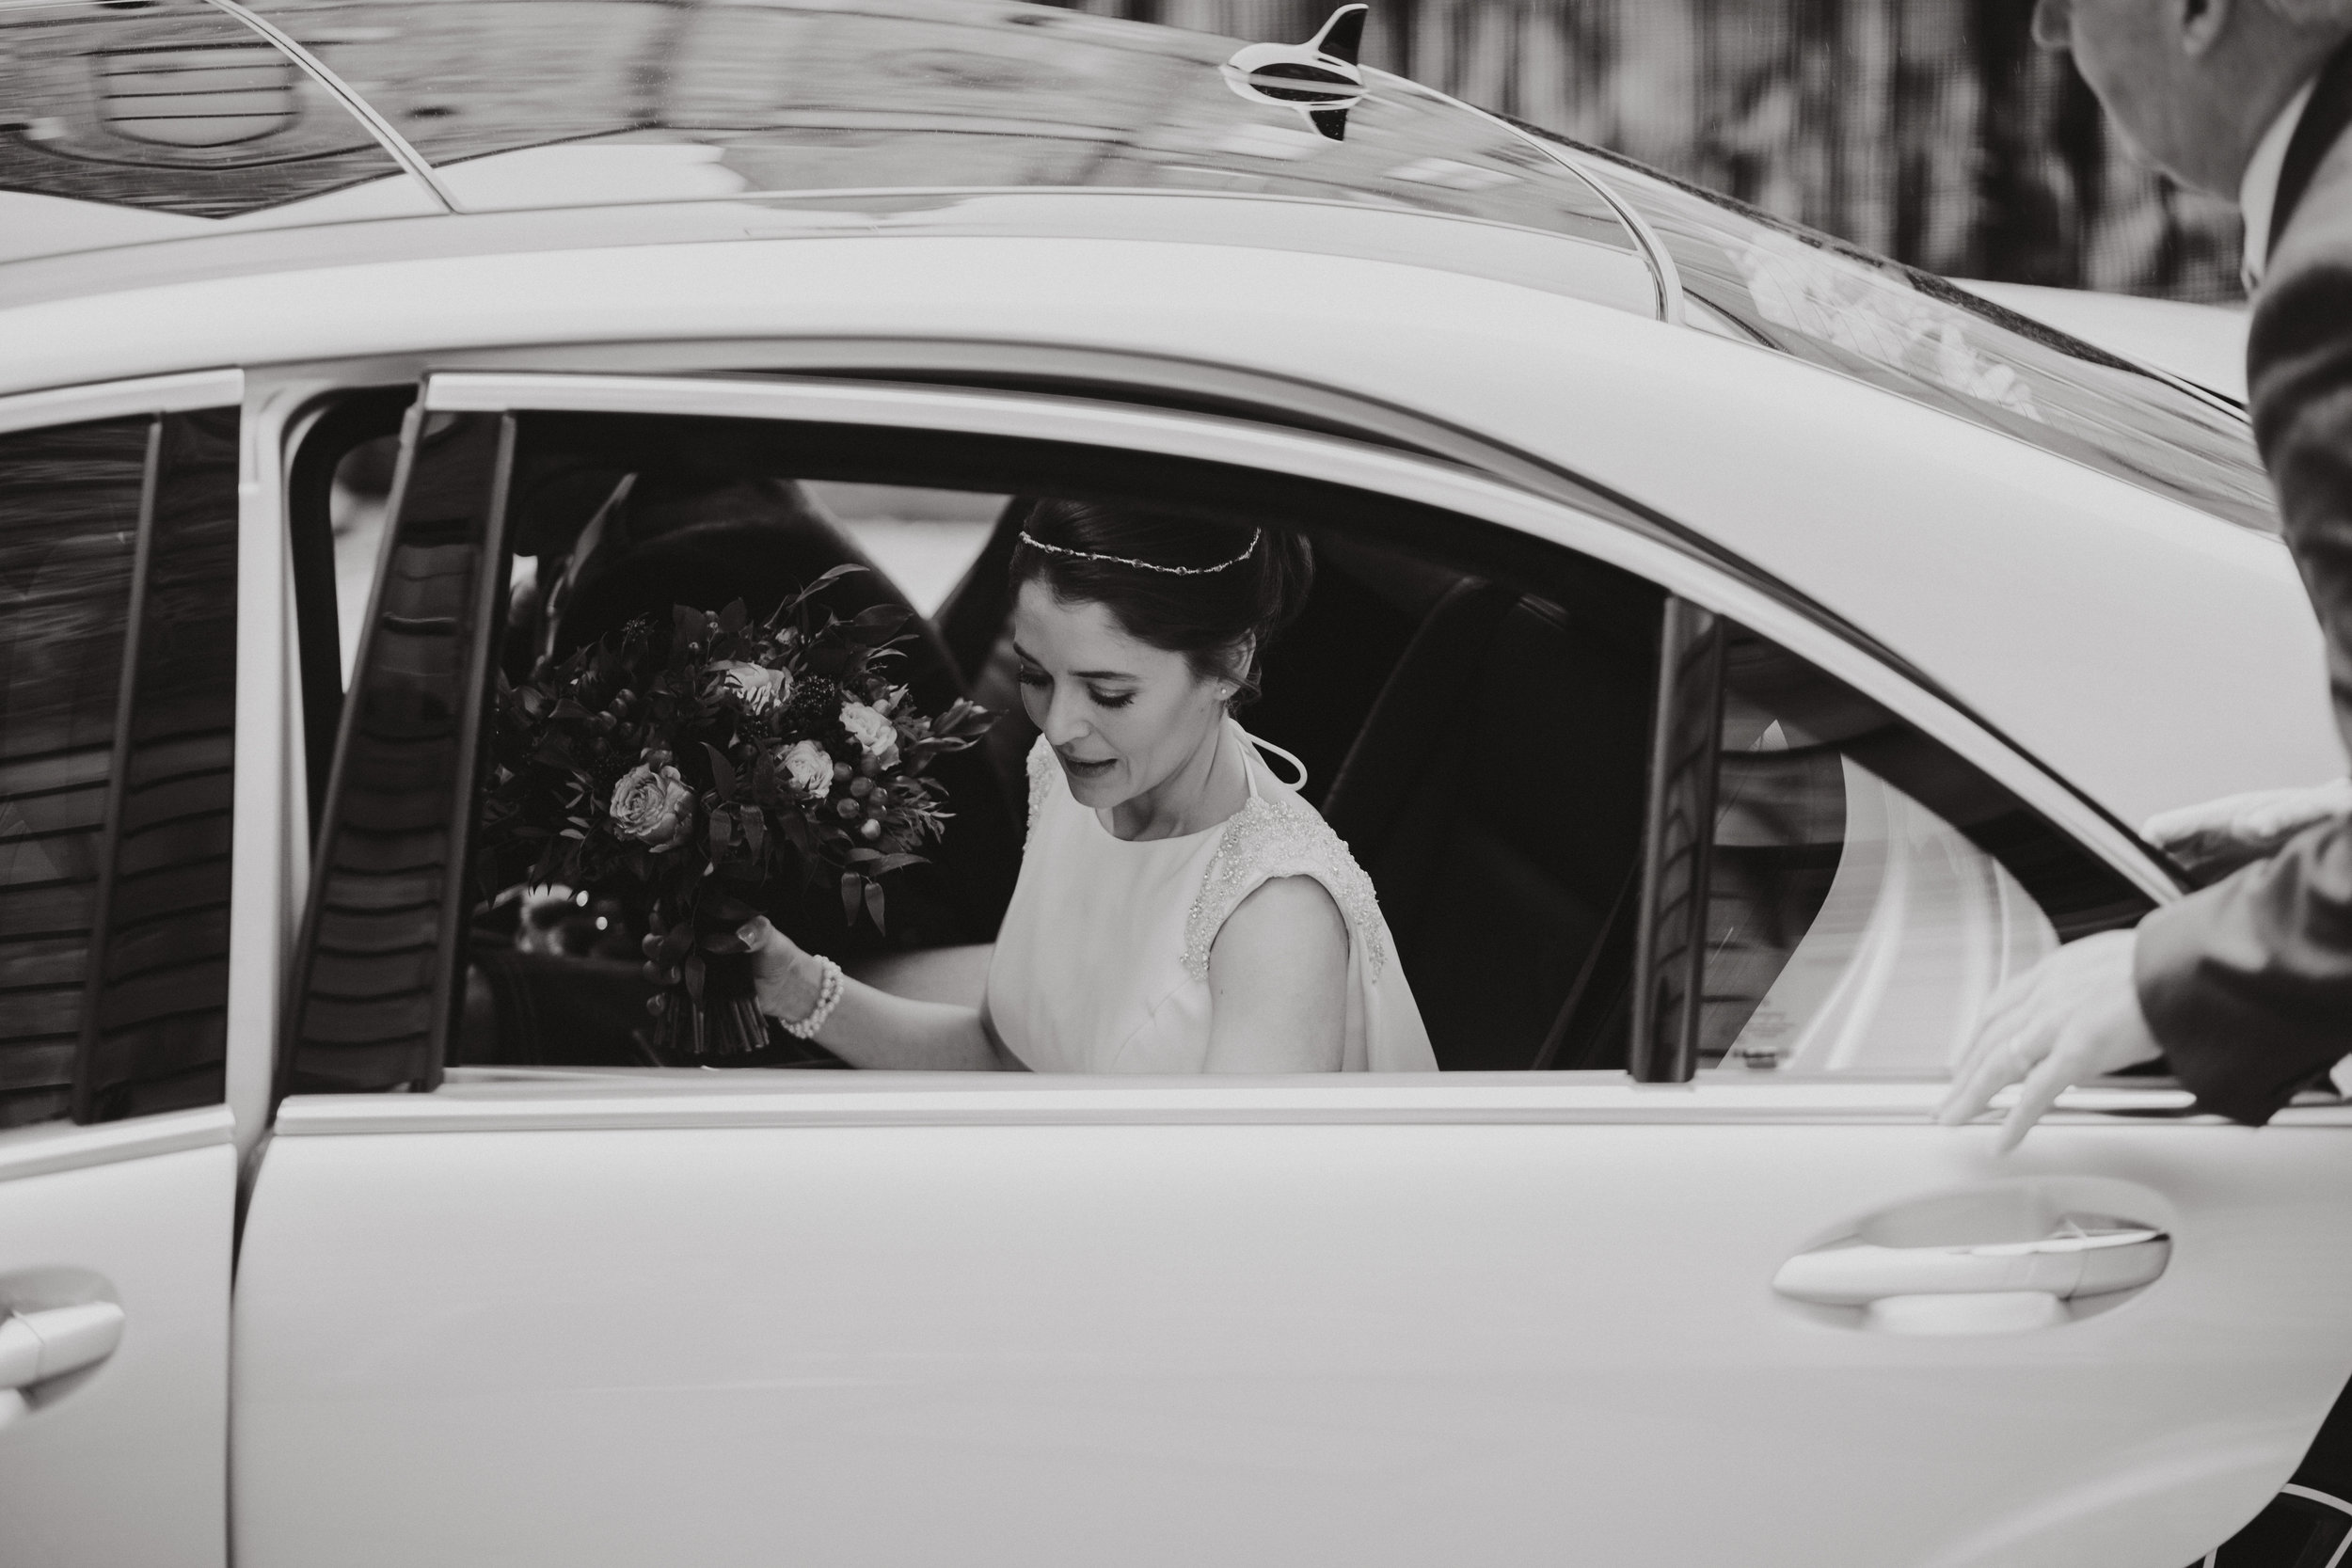 Bride Arriving, Leaving Wedding Car